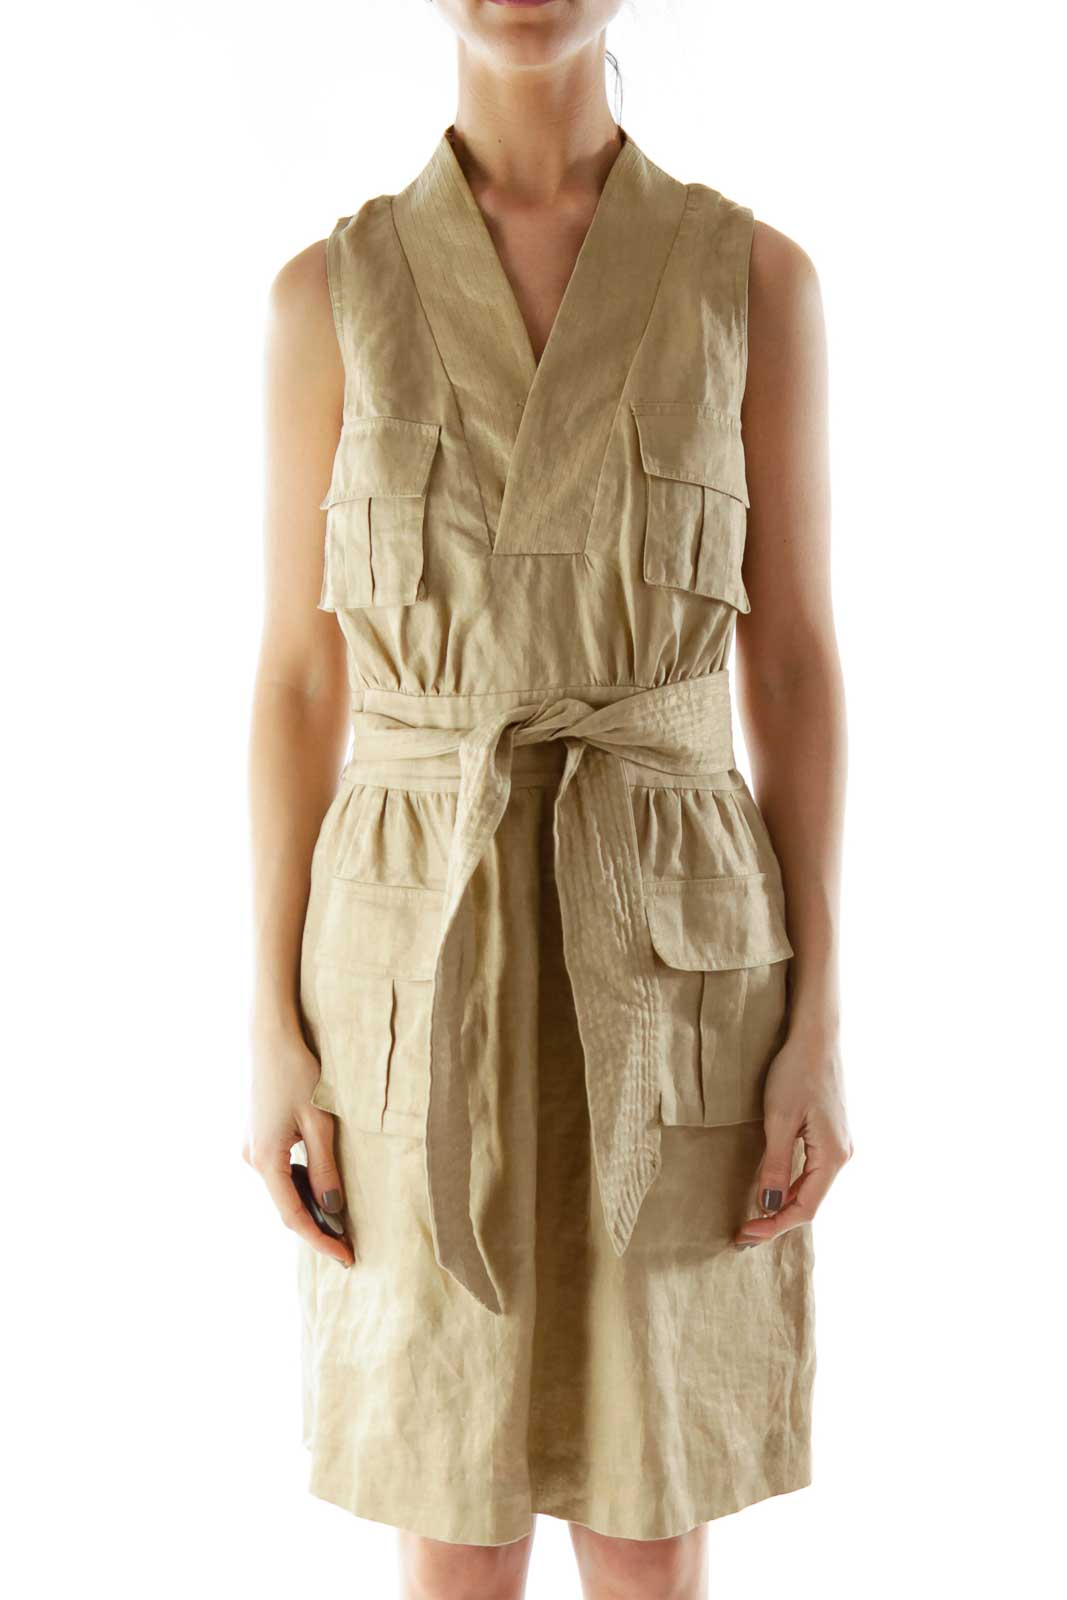 Beige Metallic Linen Day Dress With Sash Front